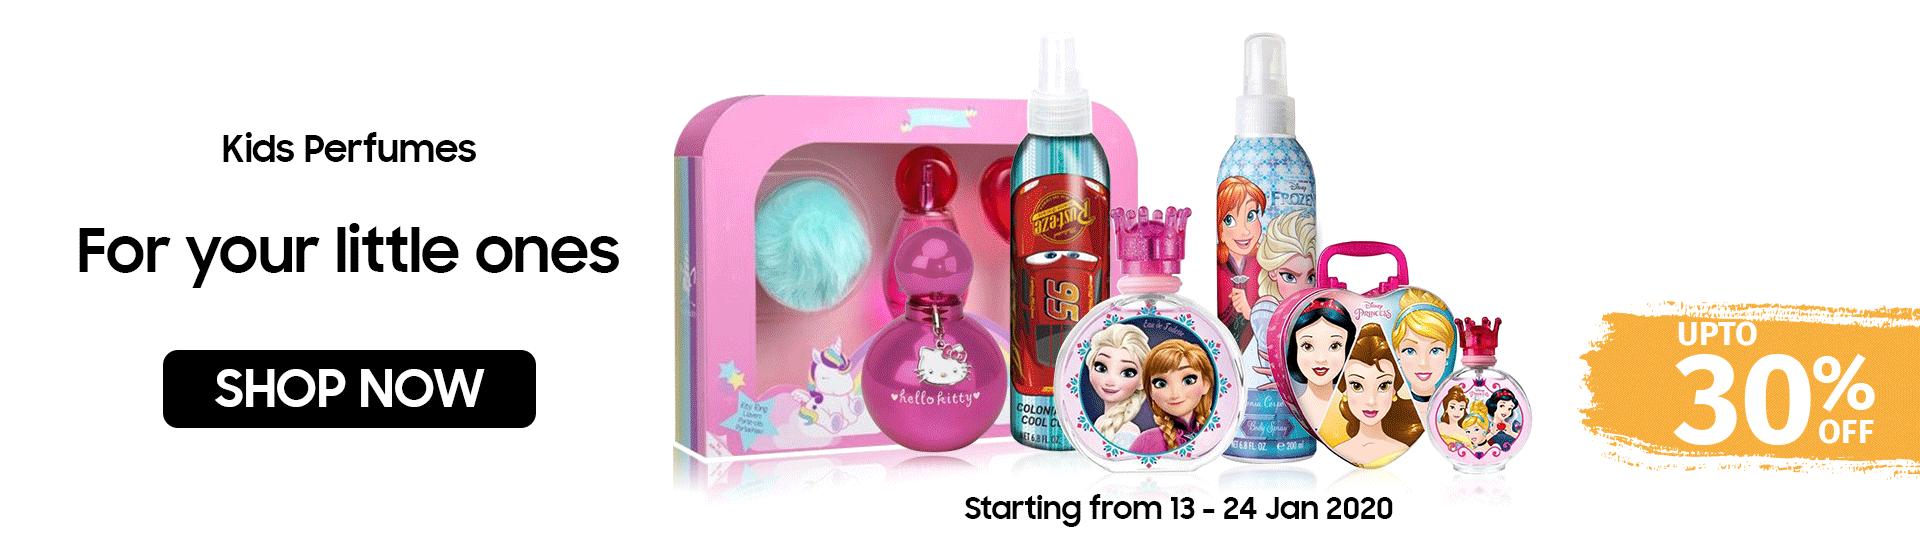 Kids Perfumes